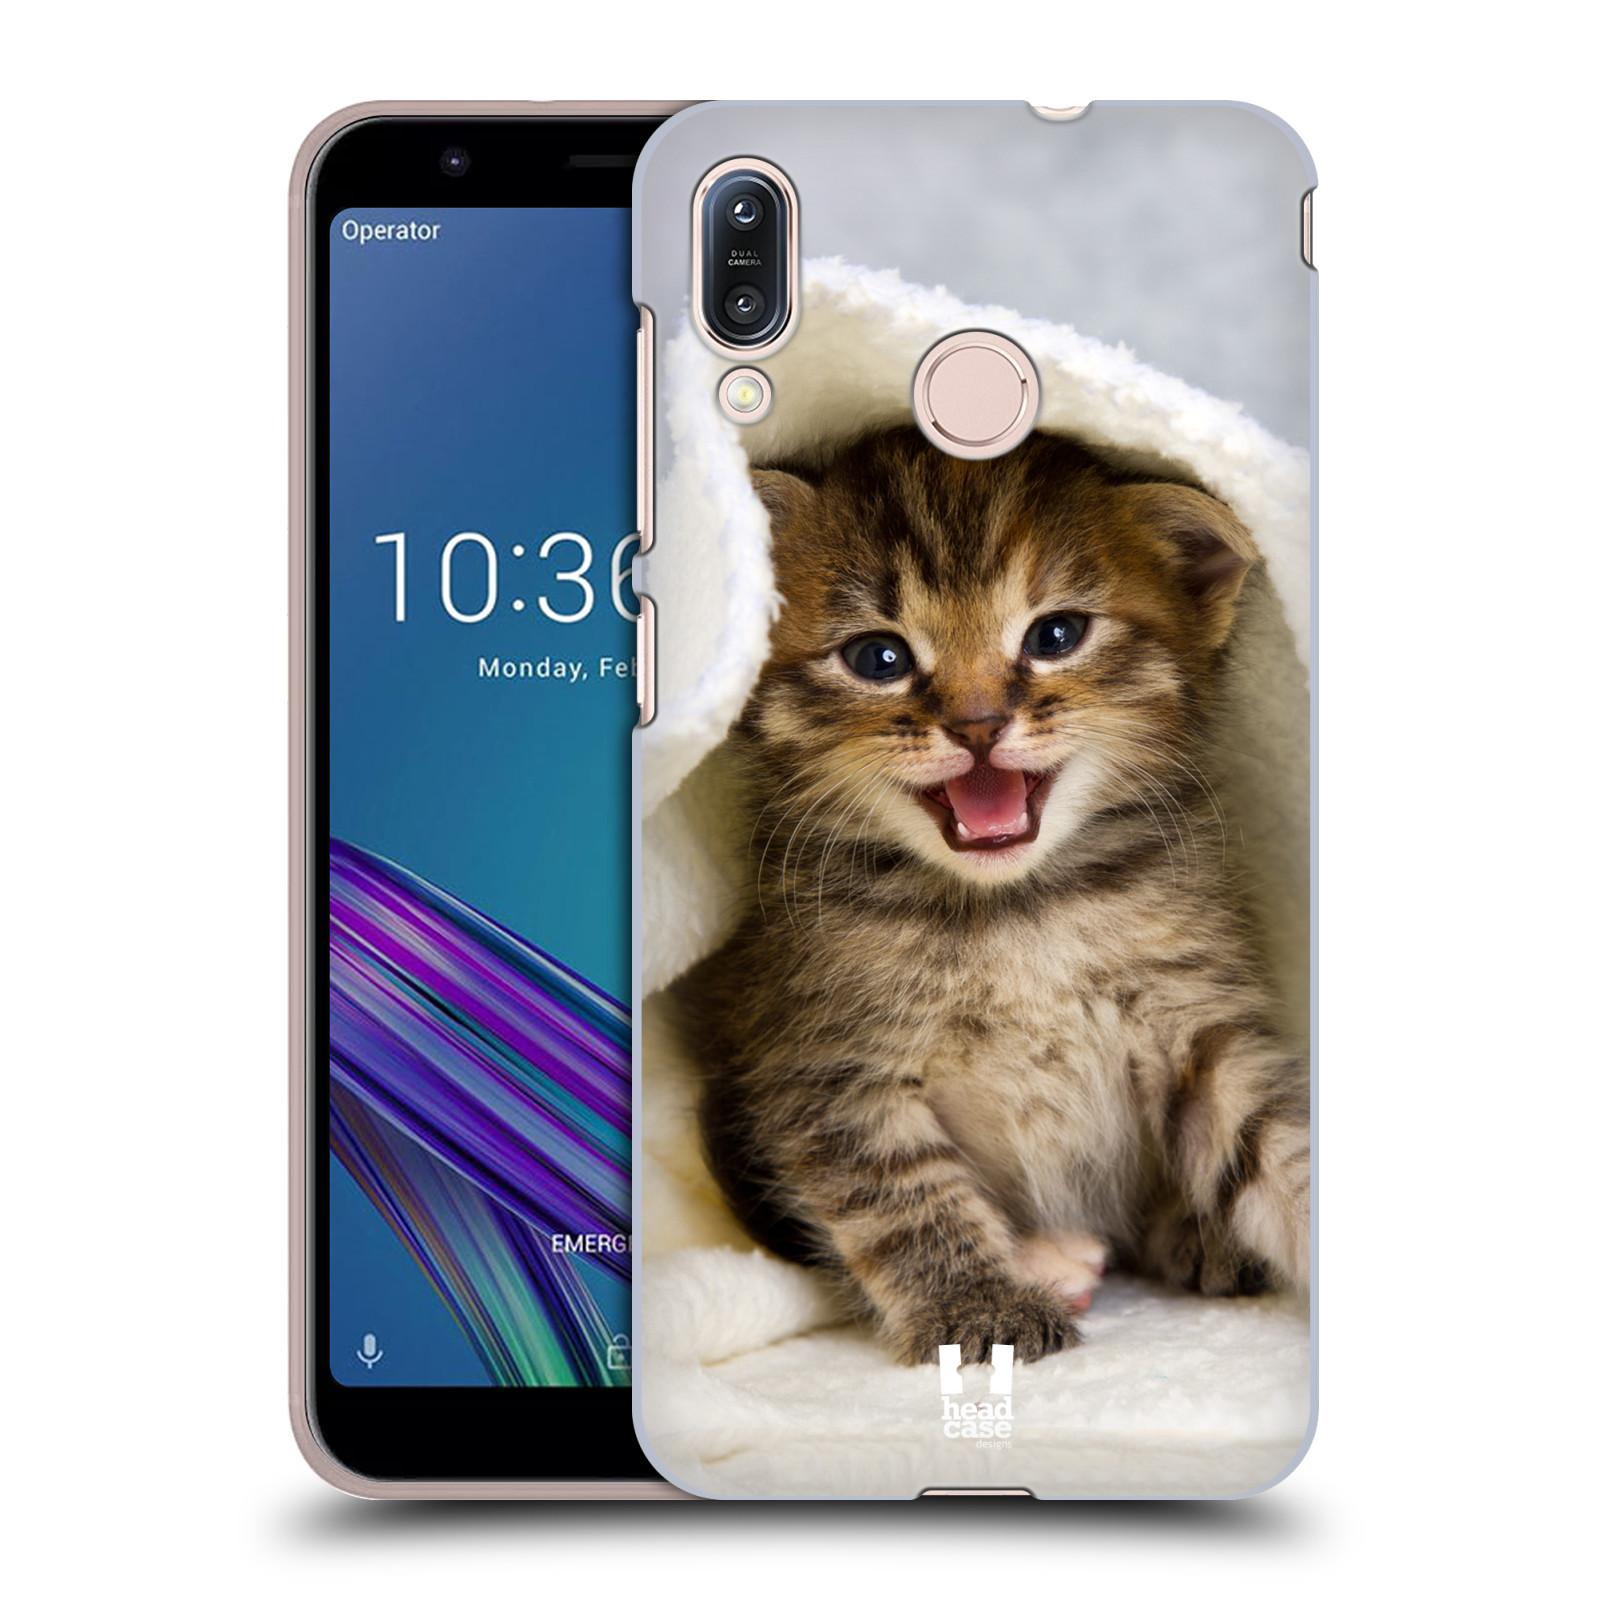 Pouzdro na mobil Asus Zenfone Max M1 (ZB555KL) - HEAD CASE - vzor Kočičky koťata foto kotě v ručníku